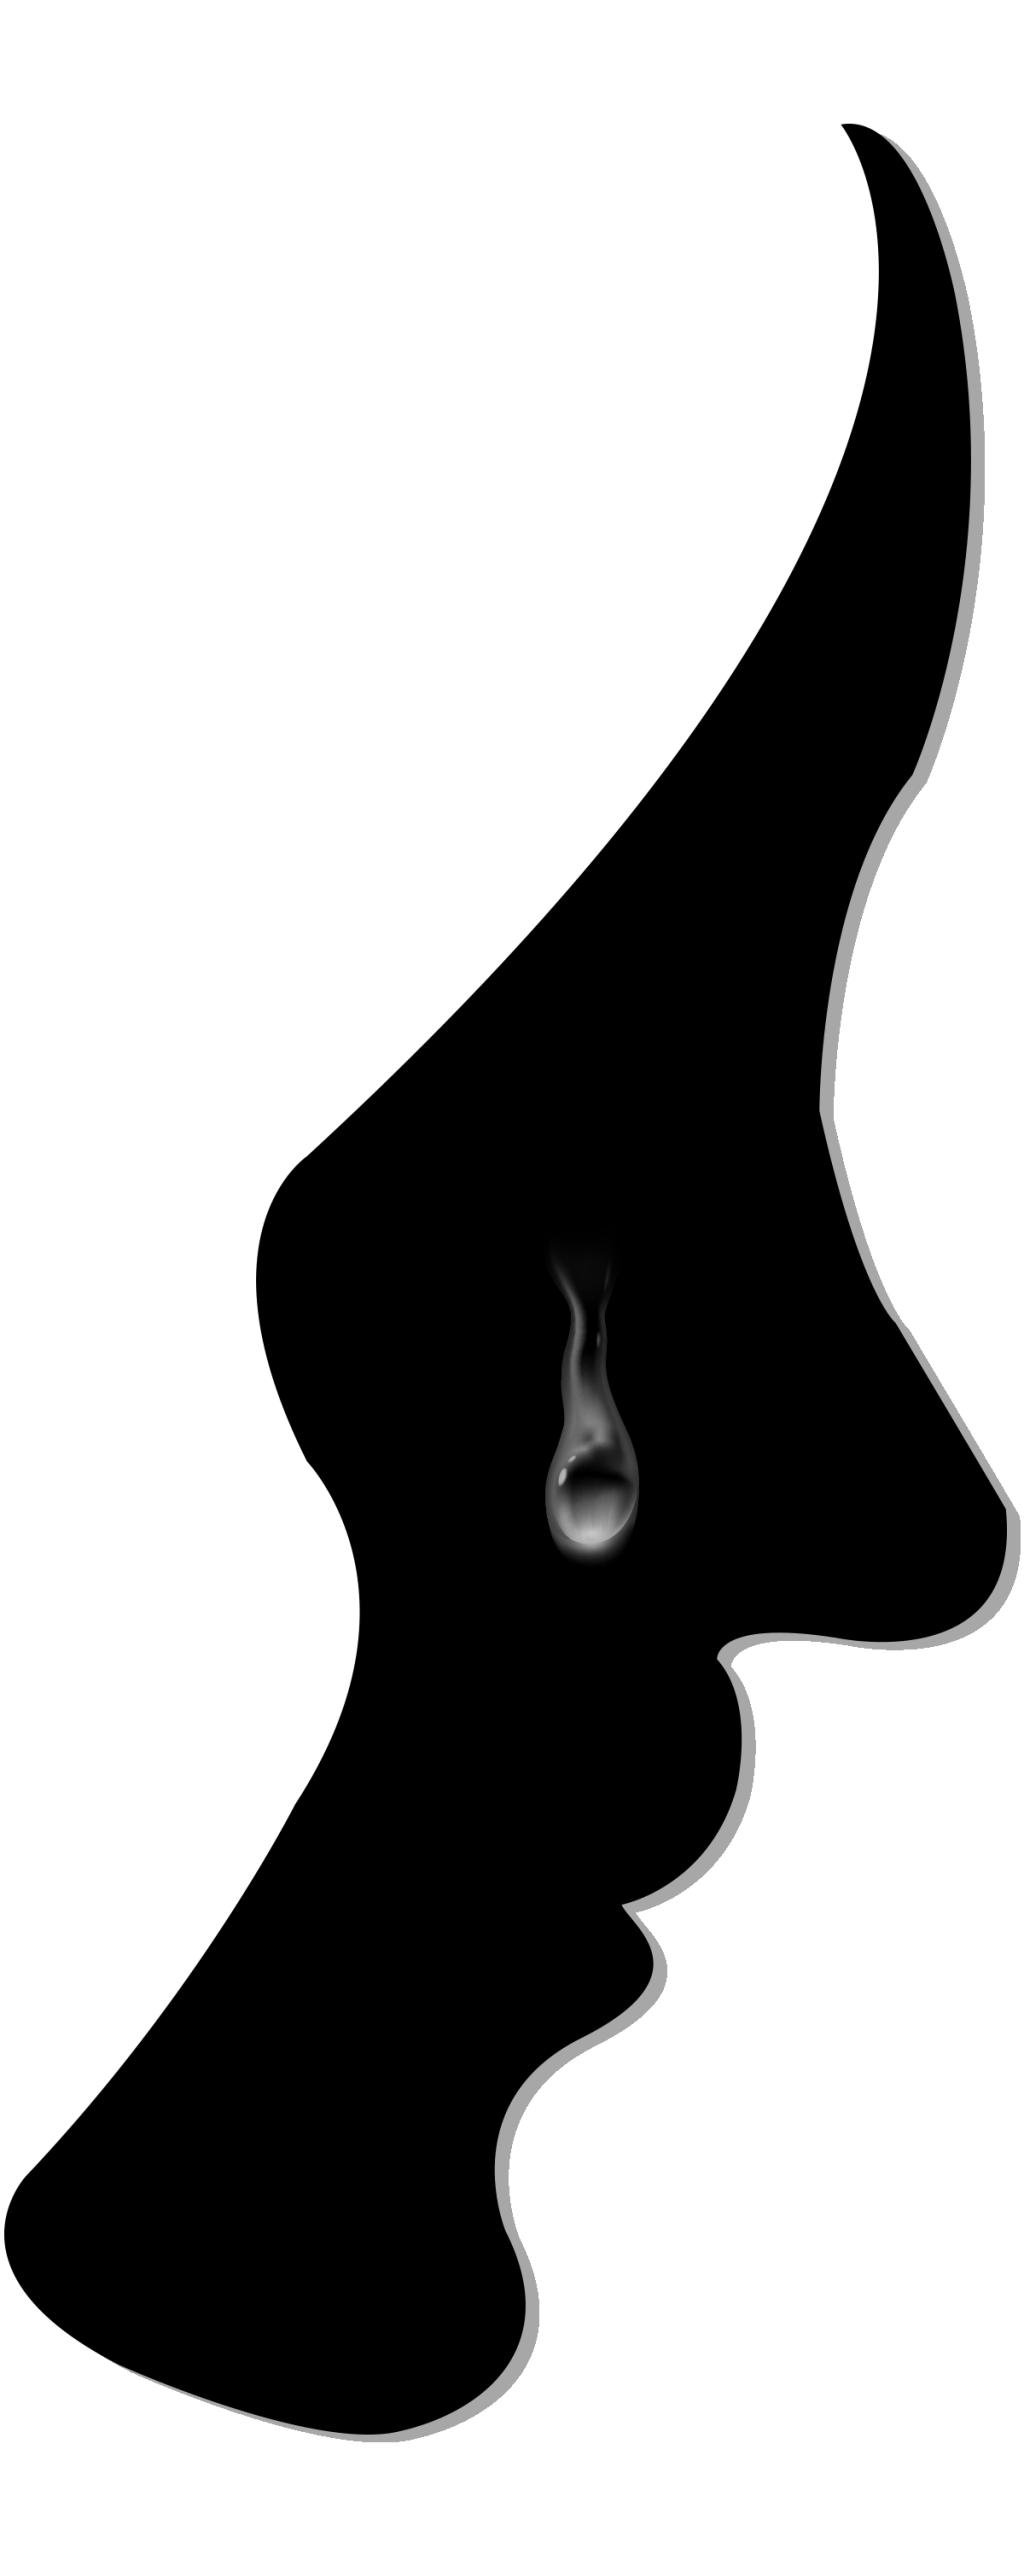 Rape spotlight shines on FAMU